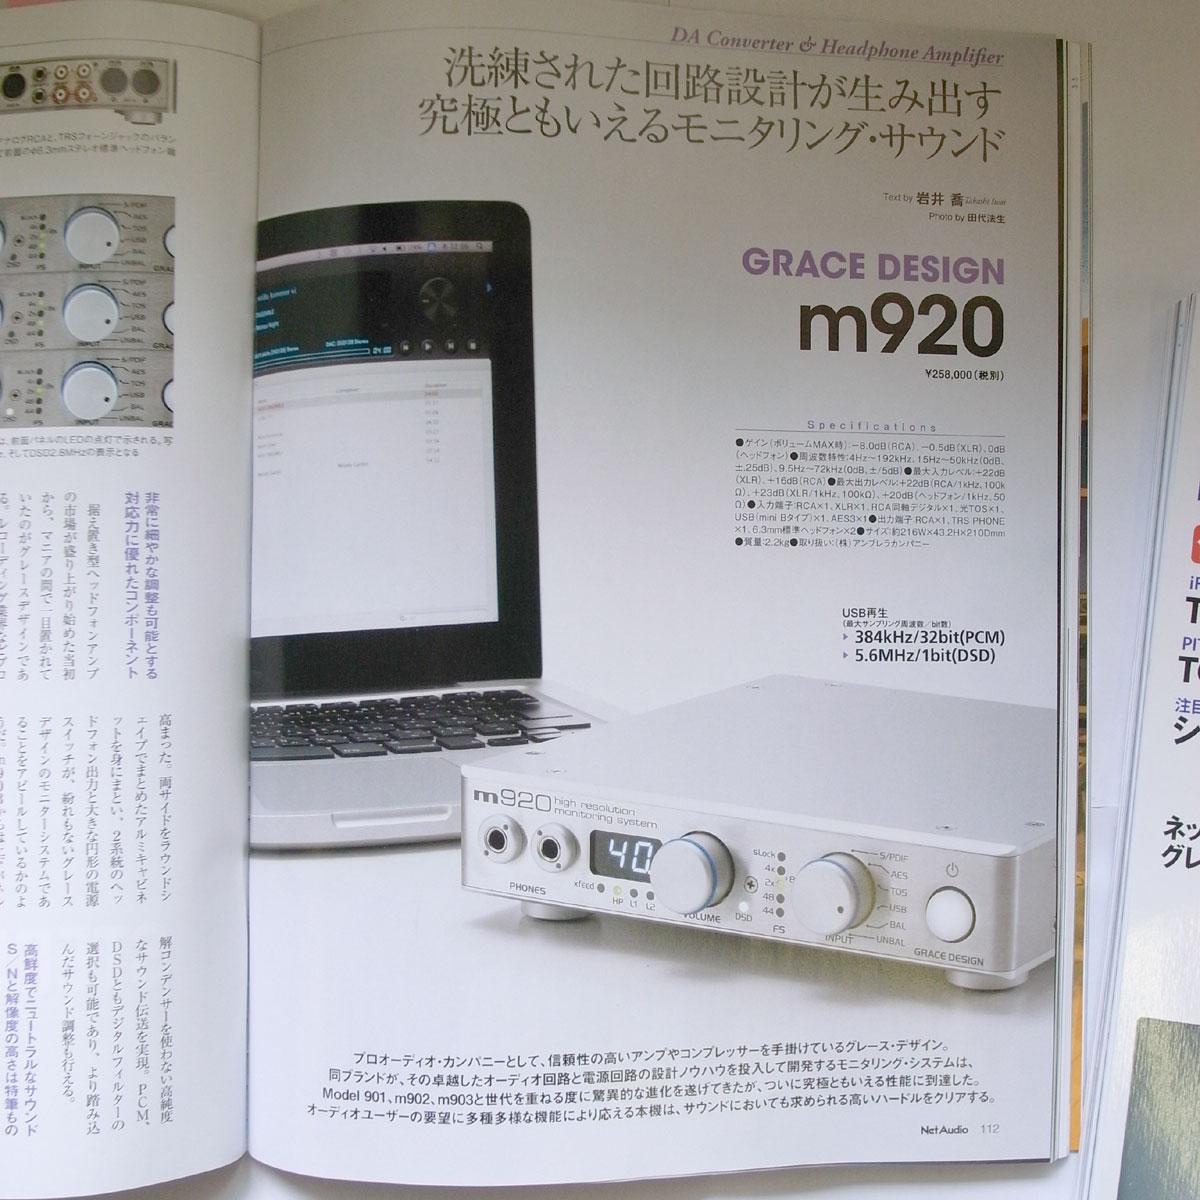 grace design,グレースデザイン,m902,m903,m920,ヘッドホンアンプ,モニターコントローラ,レビュー,評価、感想,価格